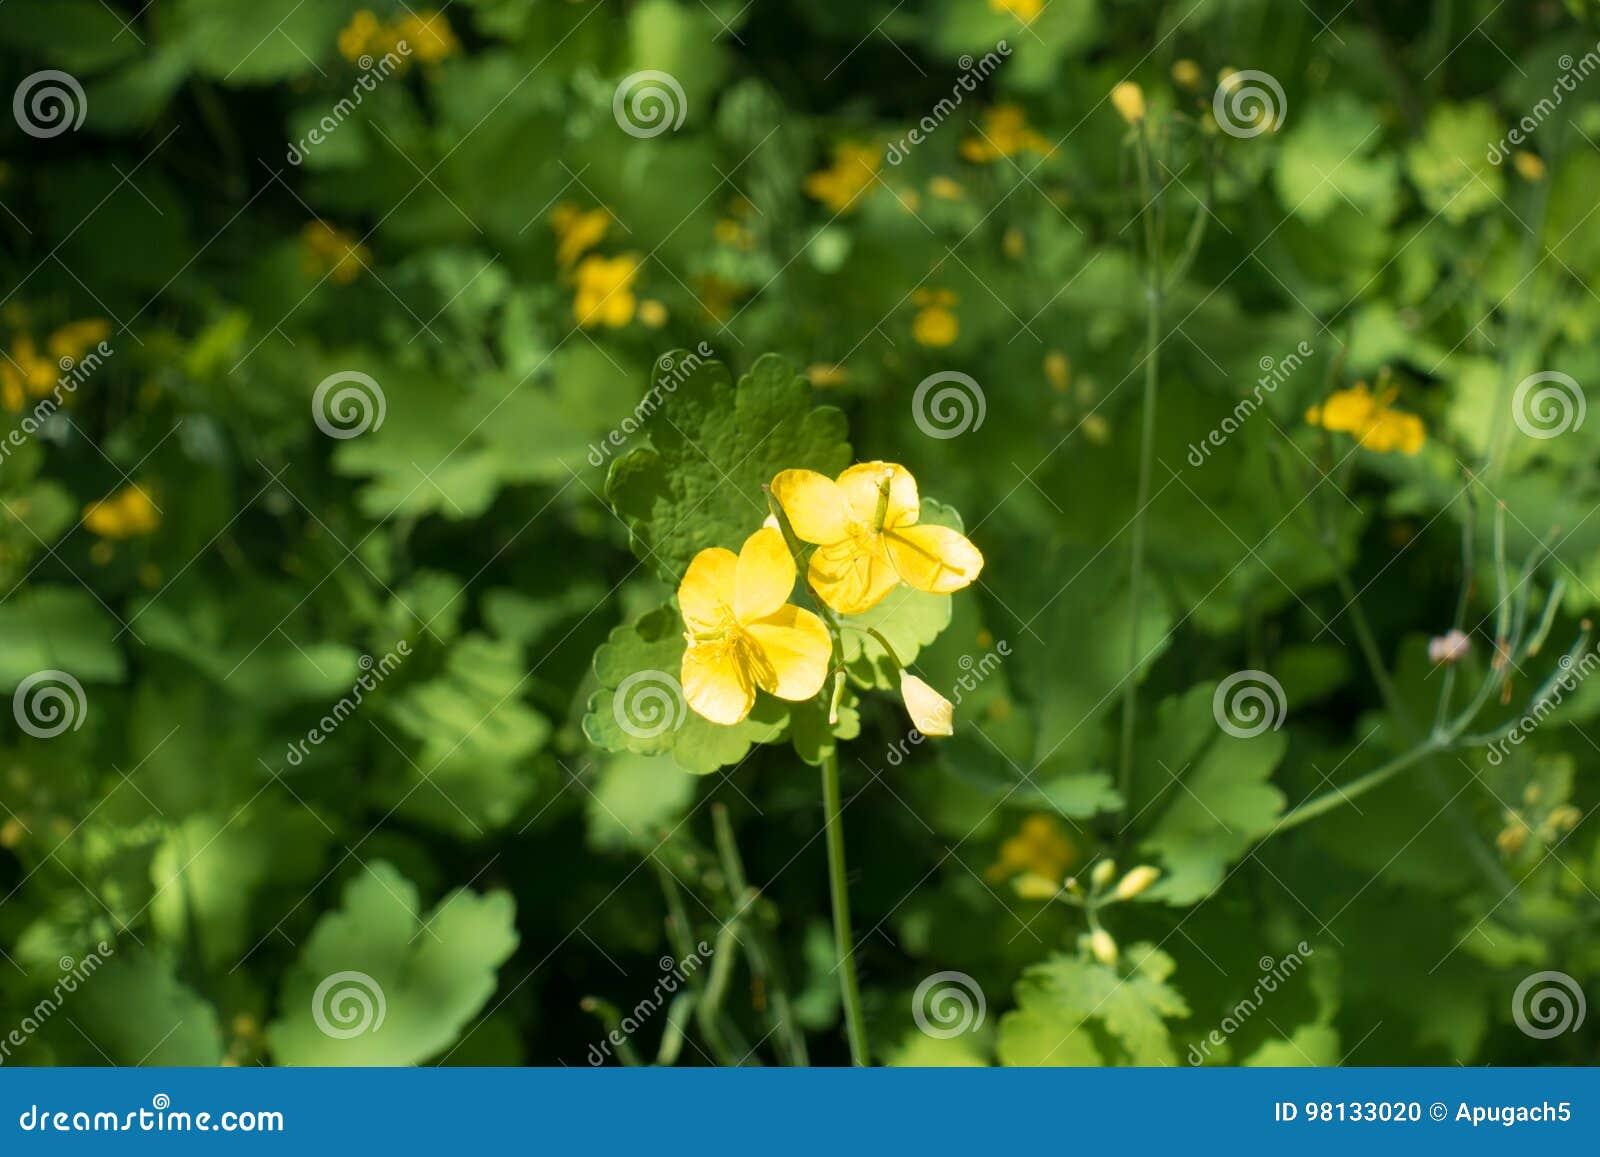 Two Four Petaled Yellow Flowers Of Chelidonium Stock Photo Image